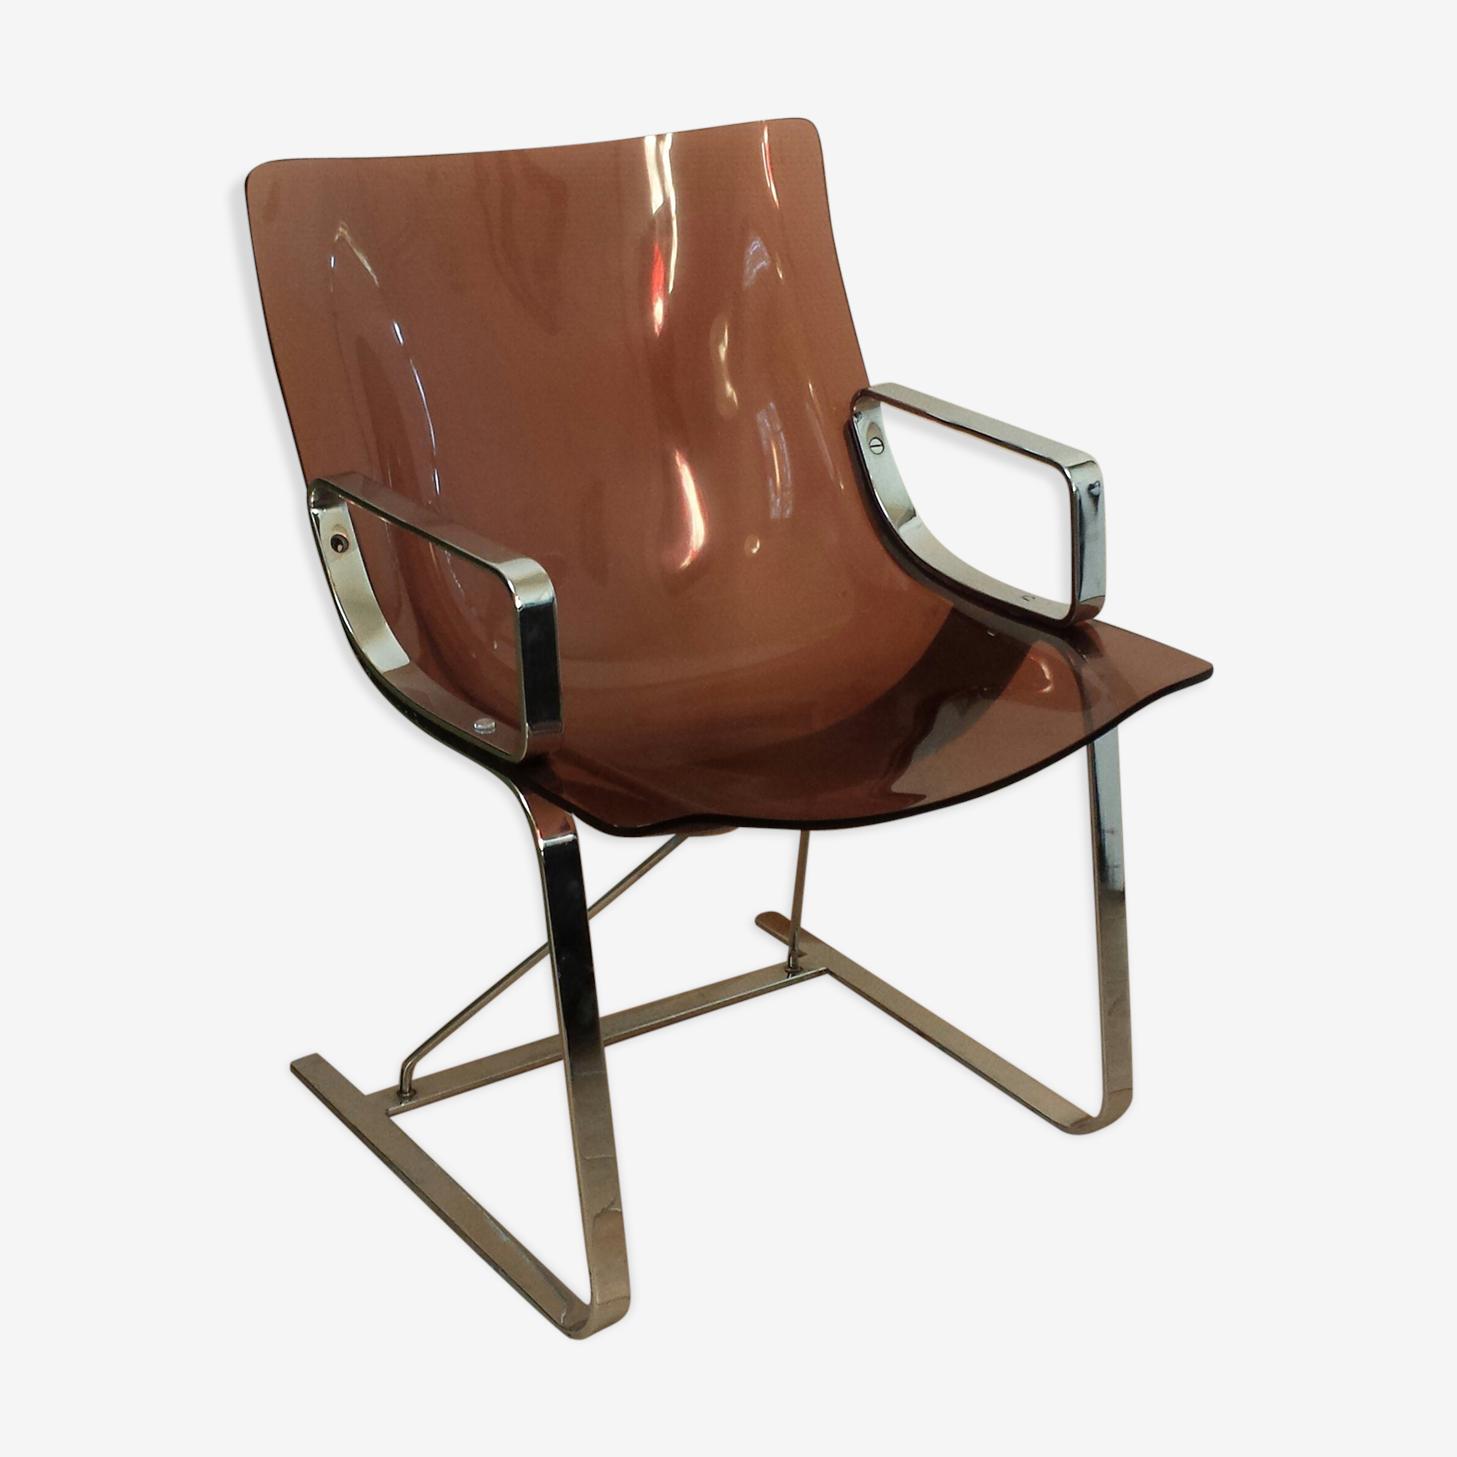 Fauteuil design 1970